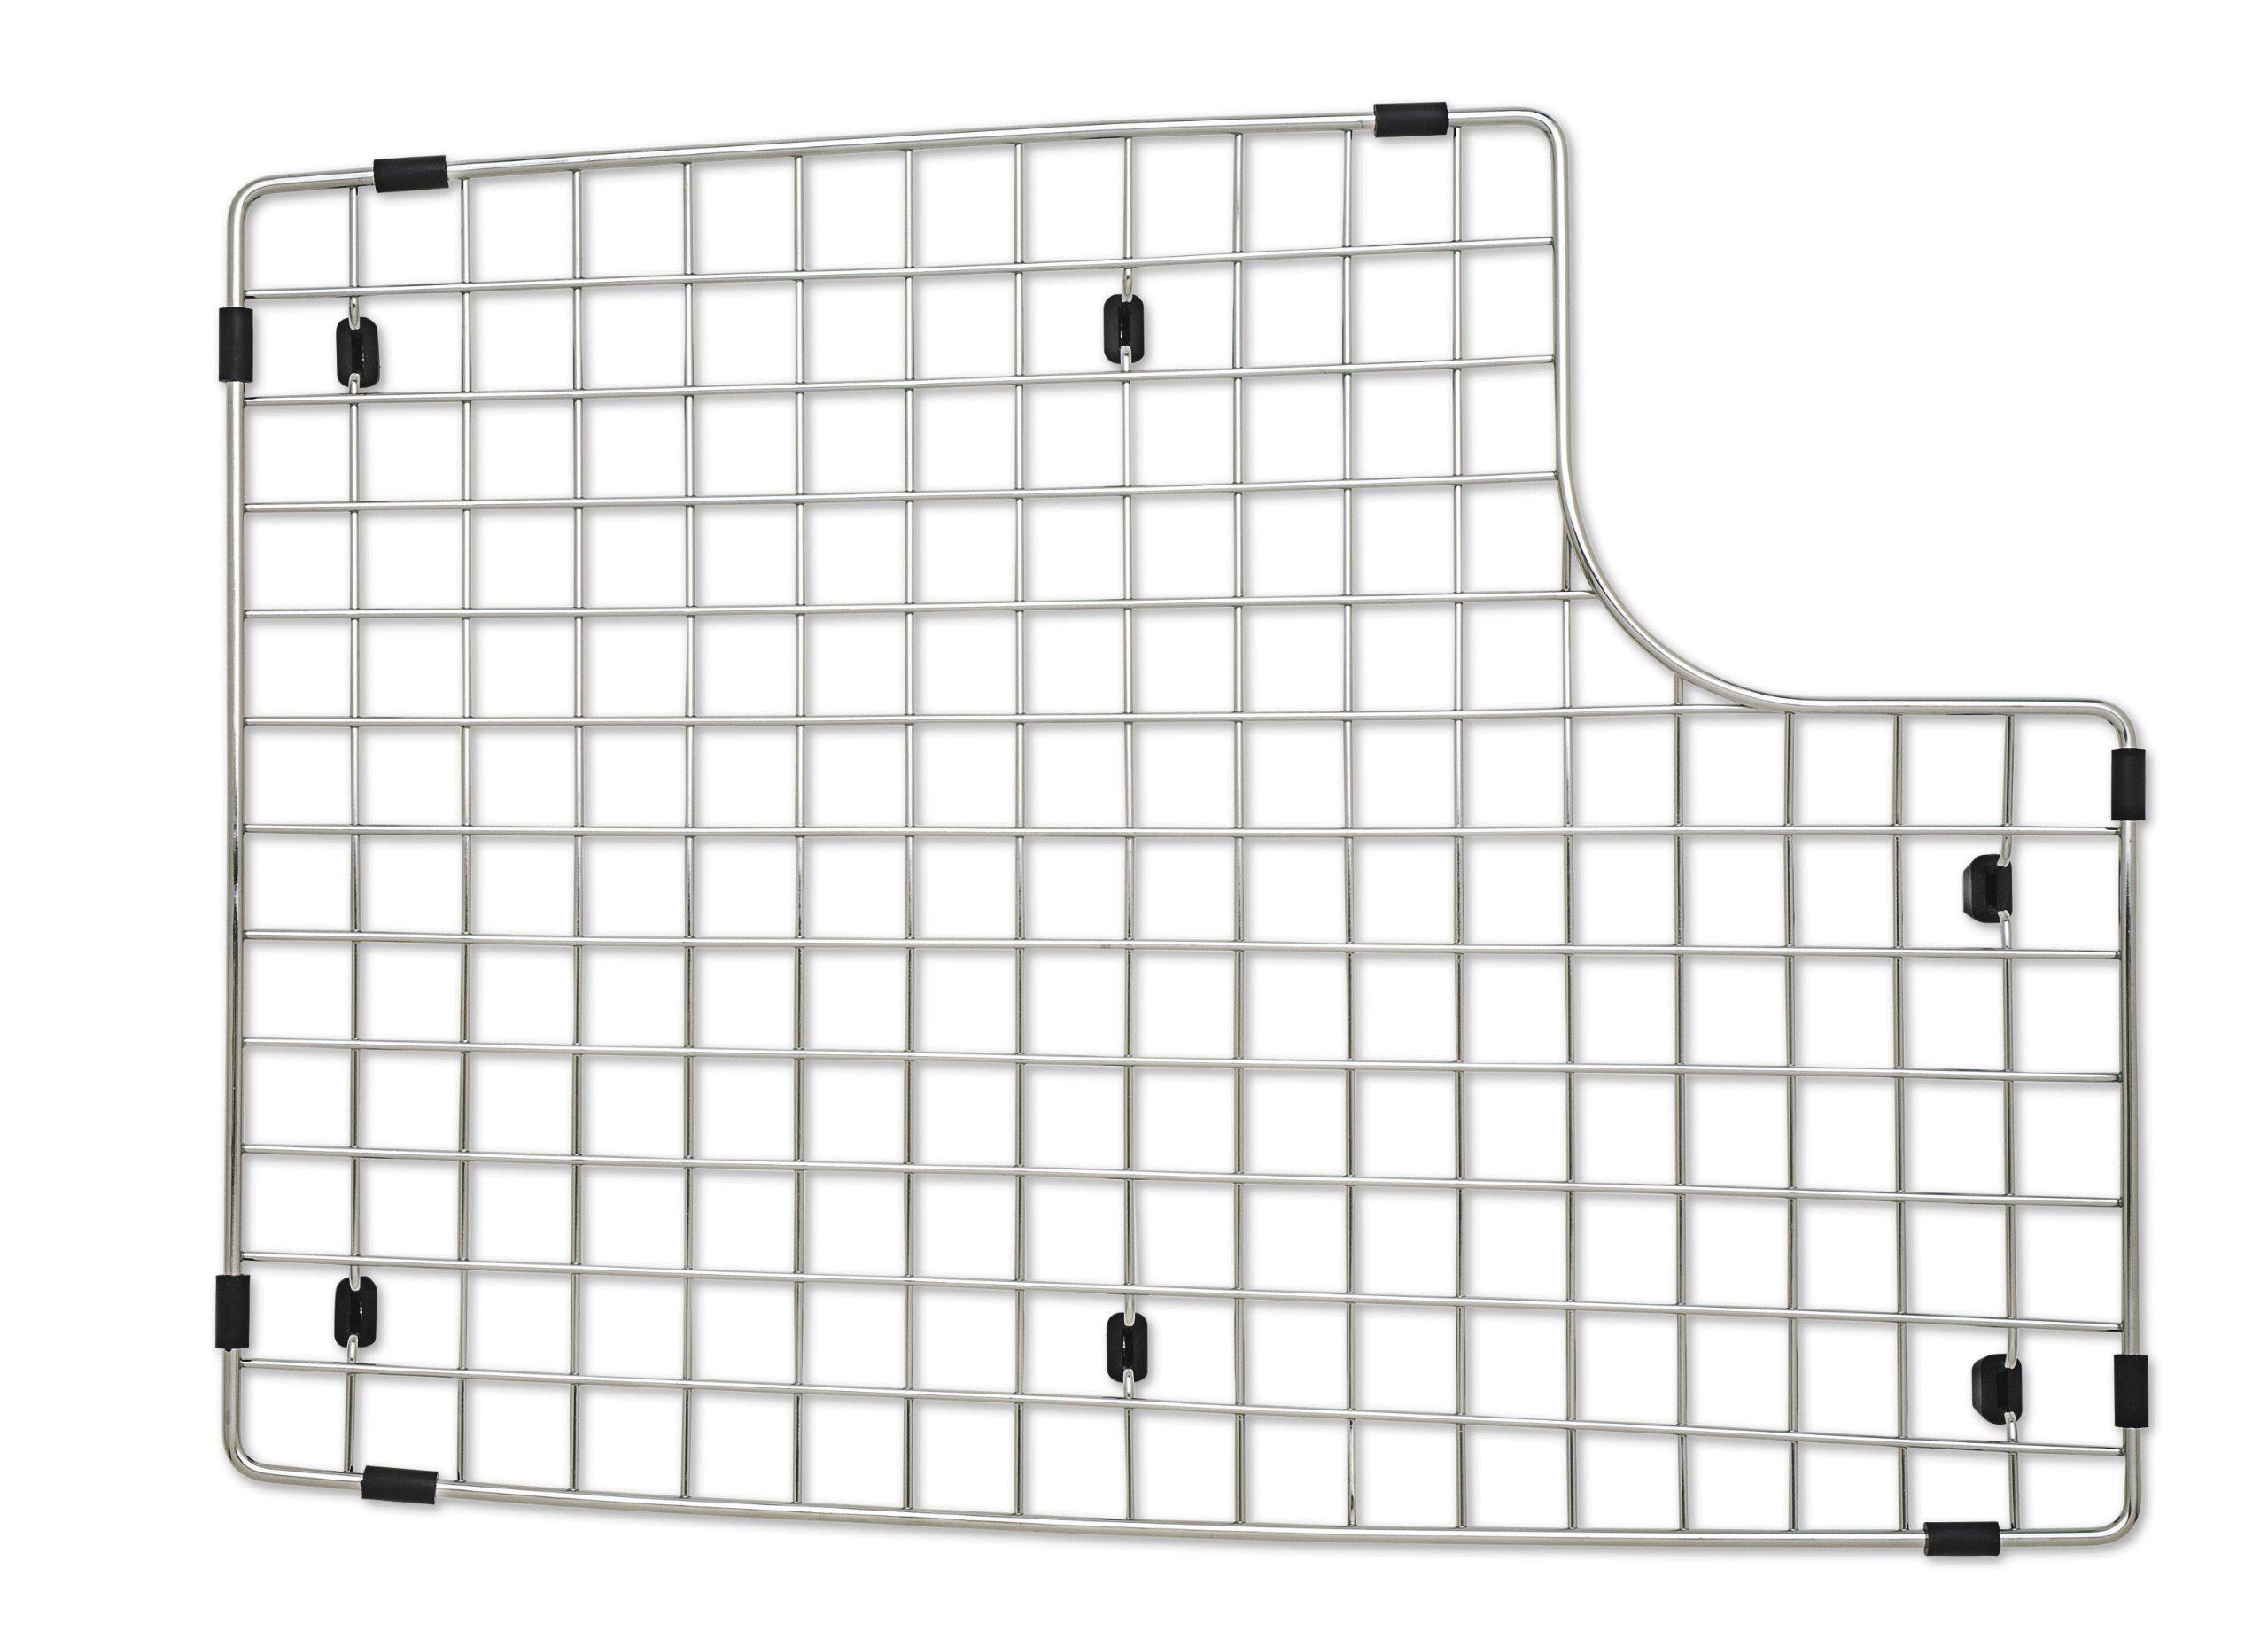 Blanco 222472 Sink Grid, Fits Performa Silgranit II Cascade, Stainless Steel